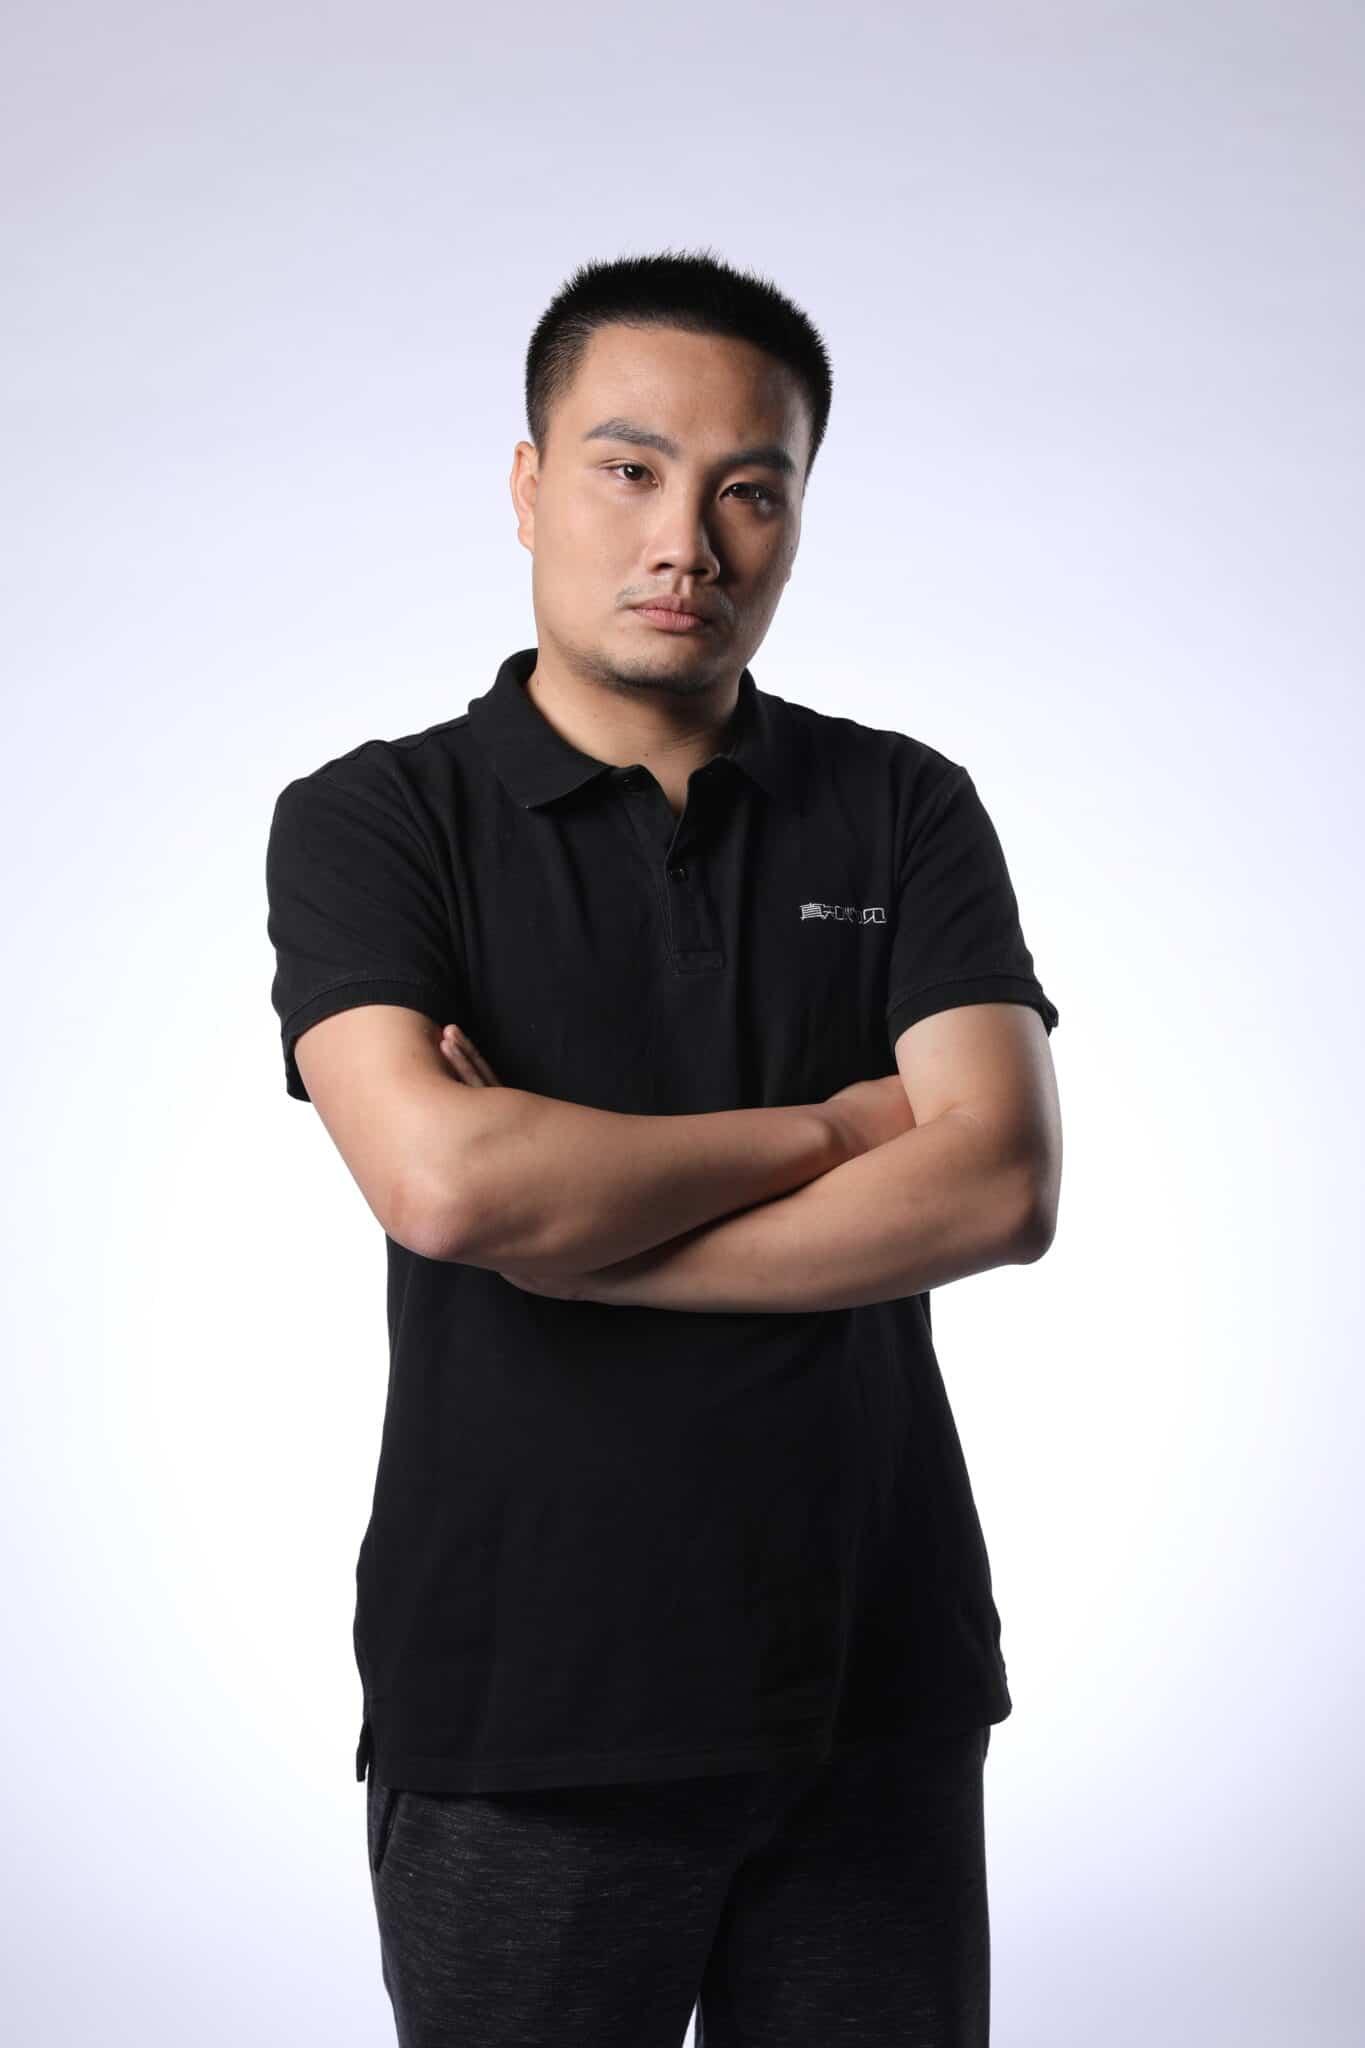 JD Wei AgileX Robotics